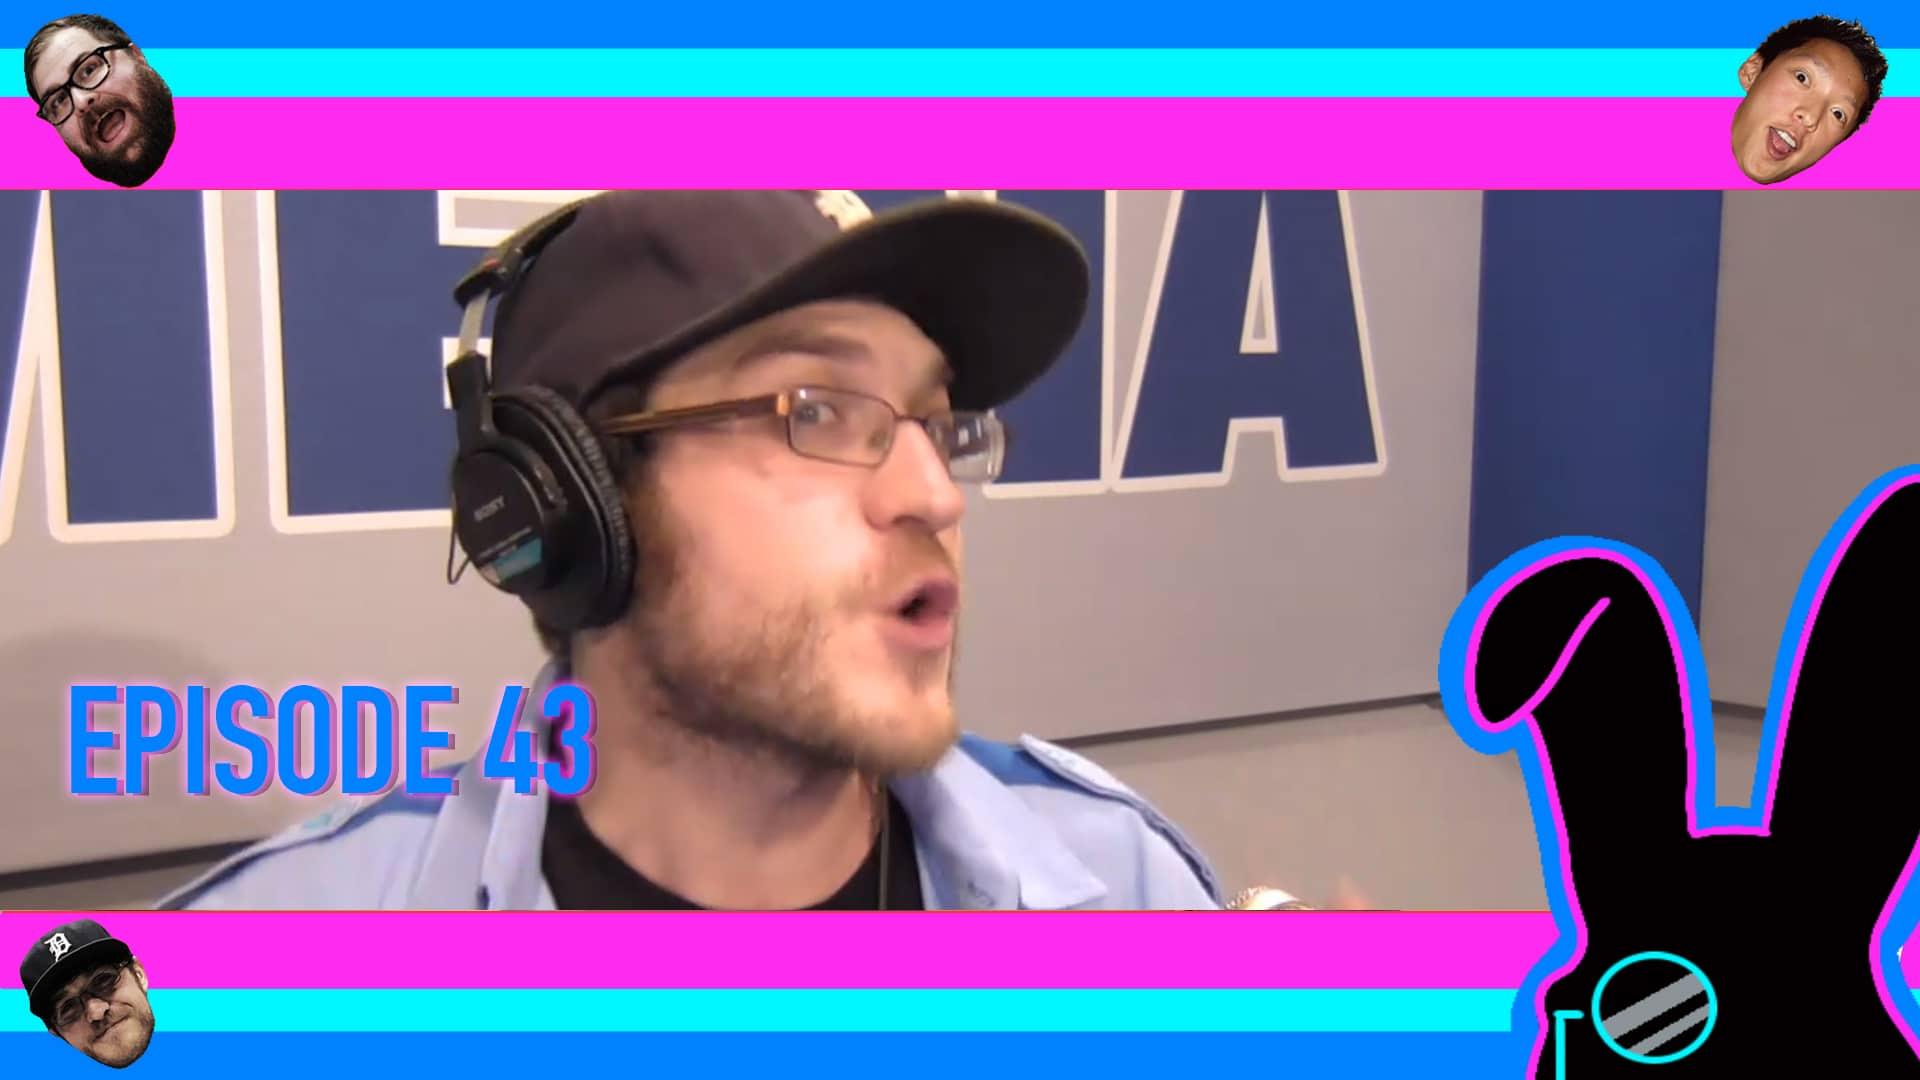 Geektainment Weekly - Episode 43